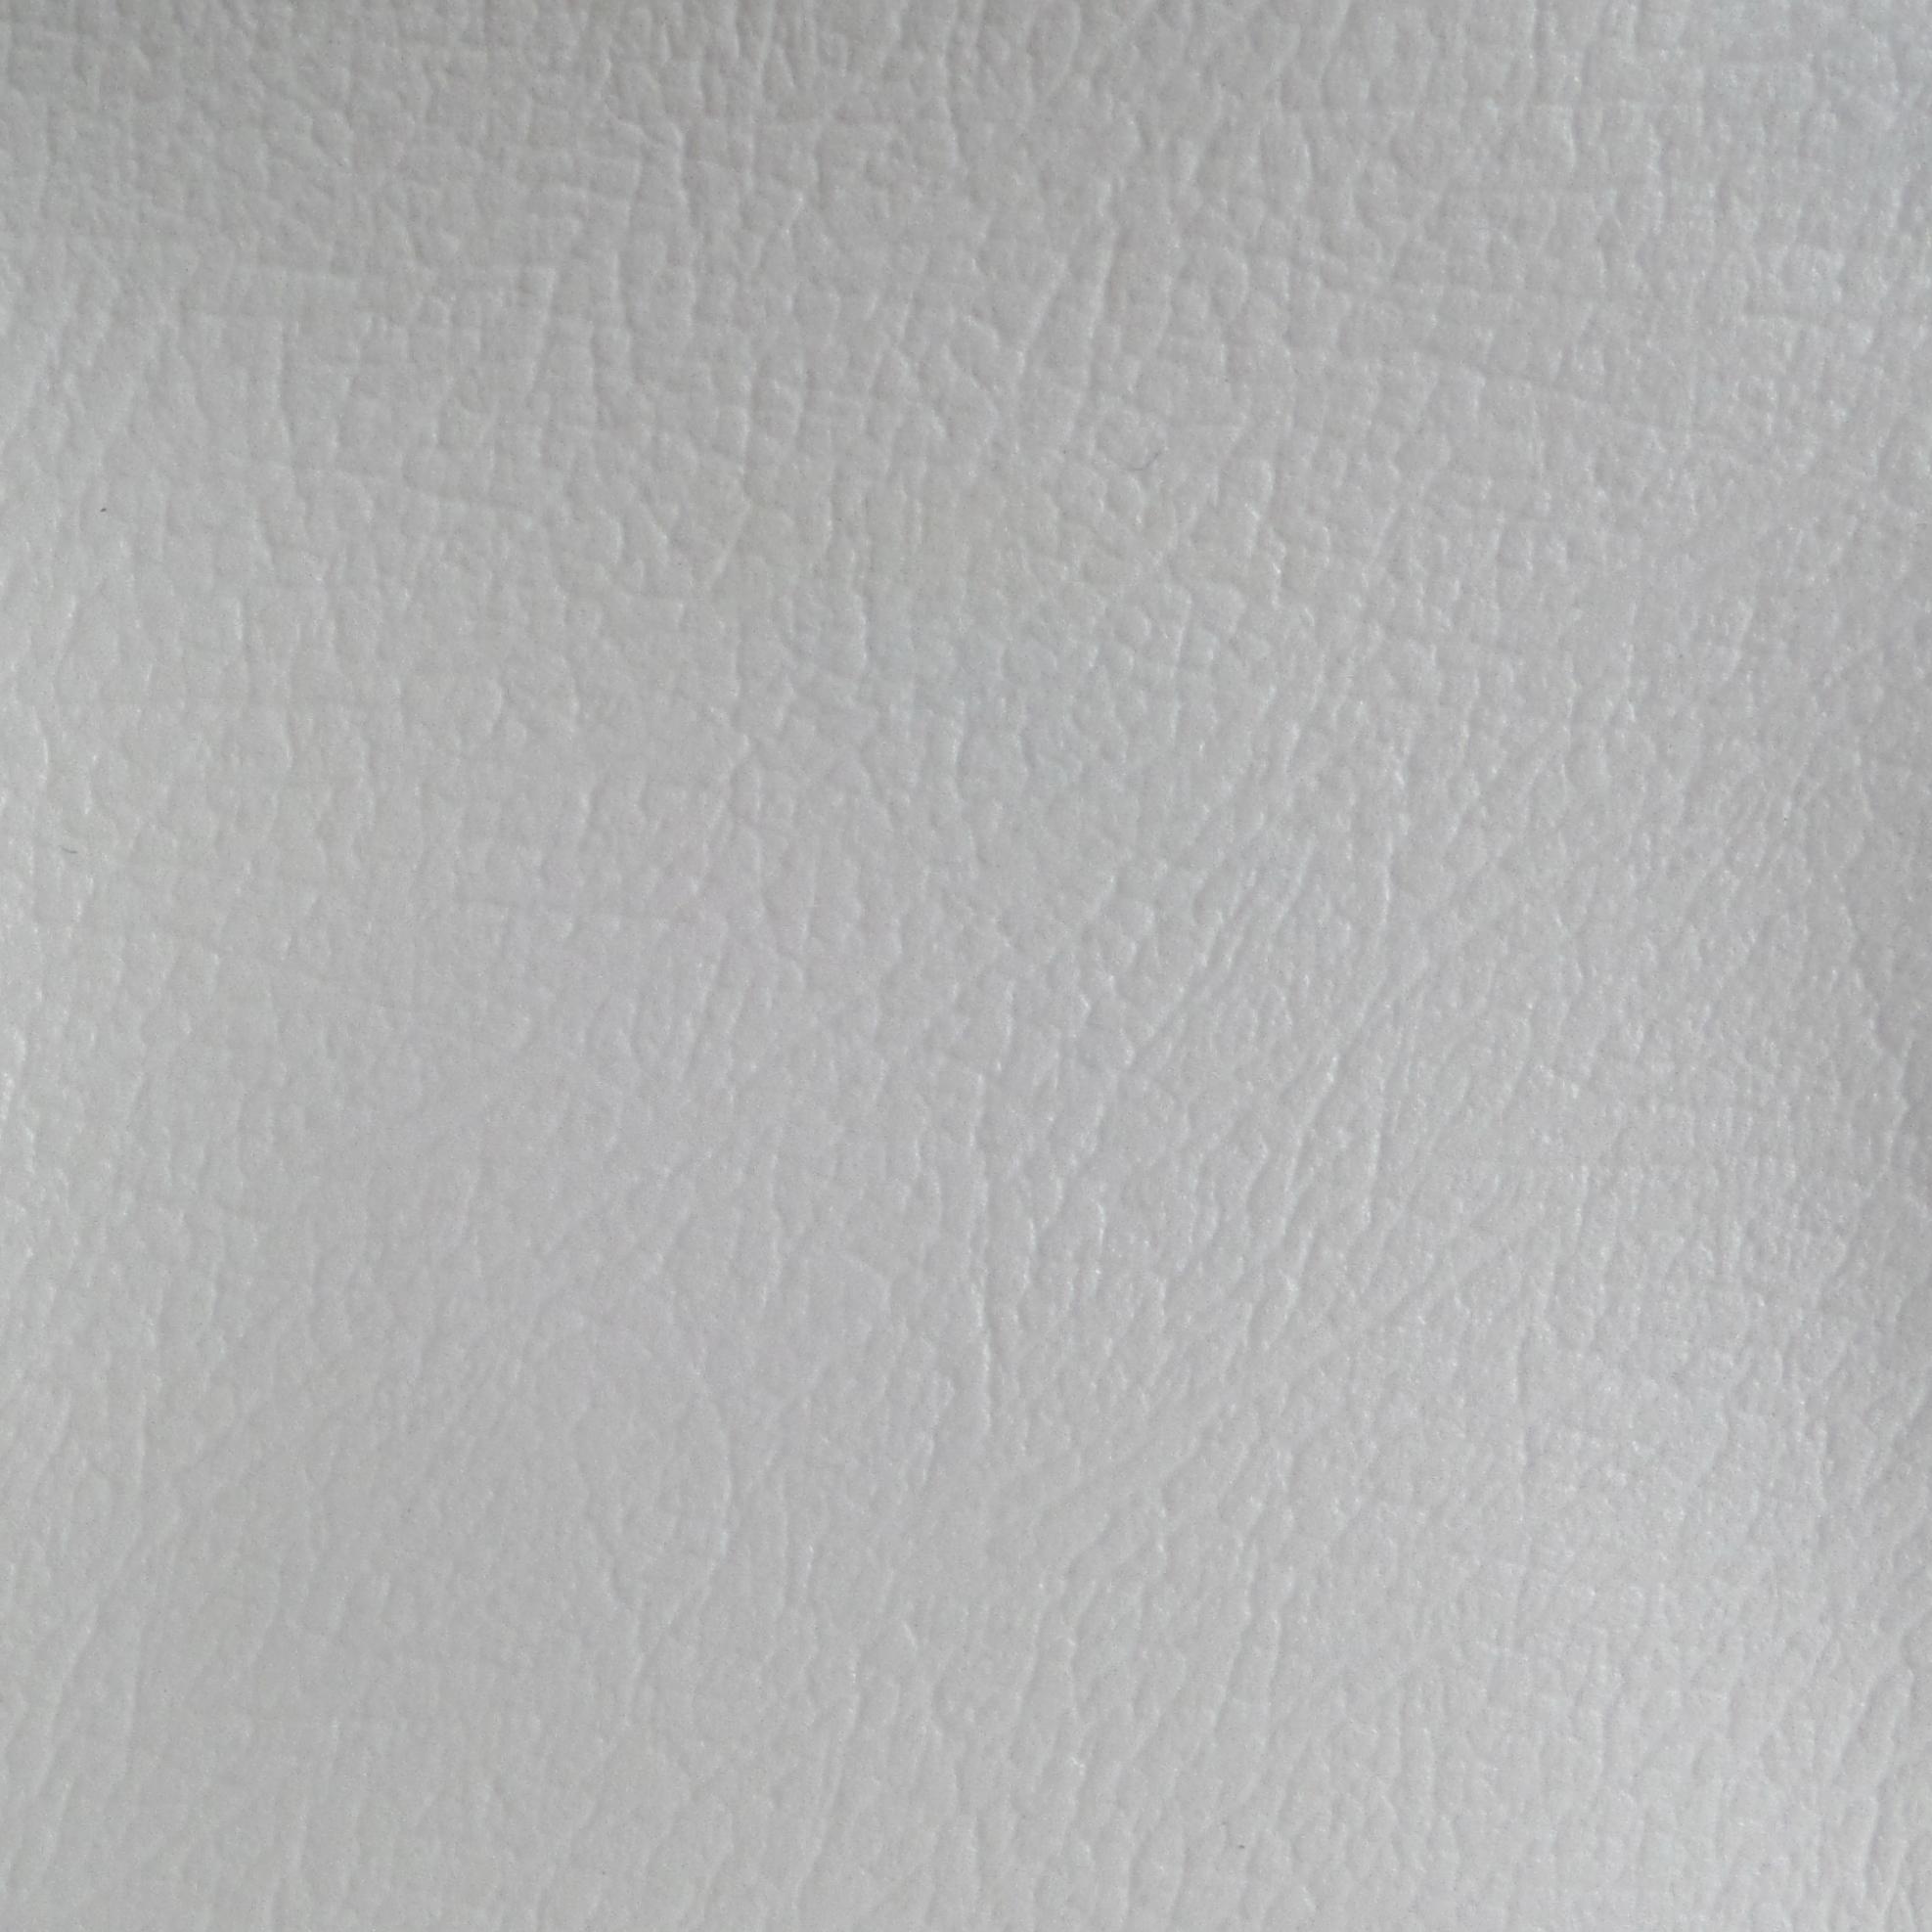 Grande Broken White Leather Sample